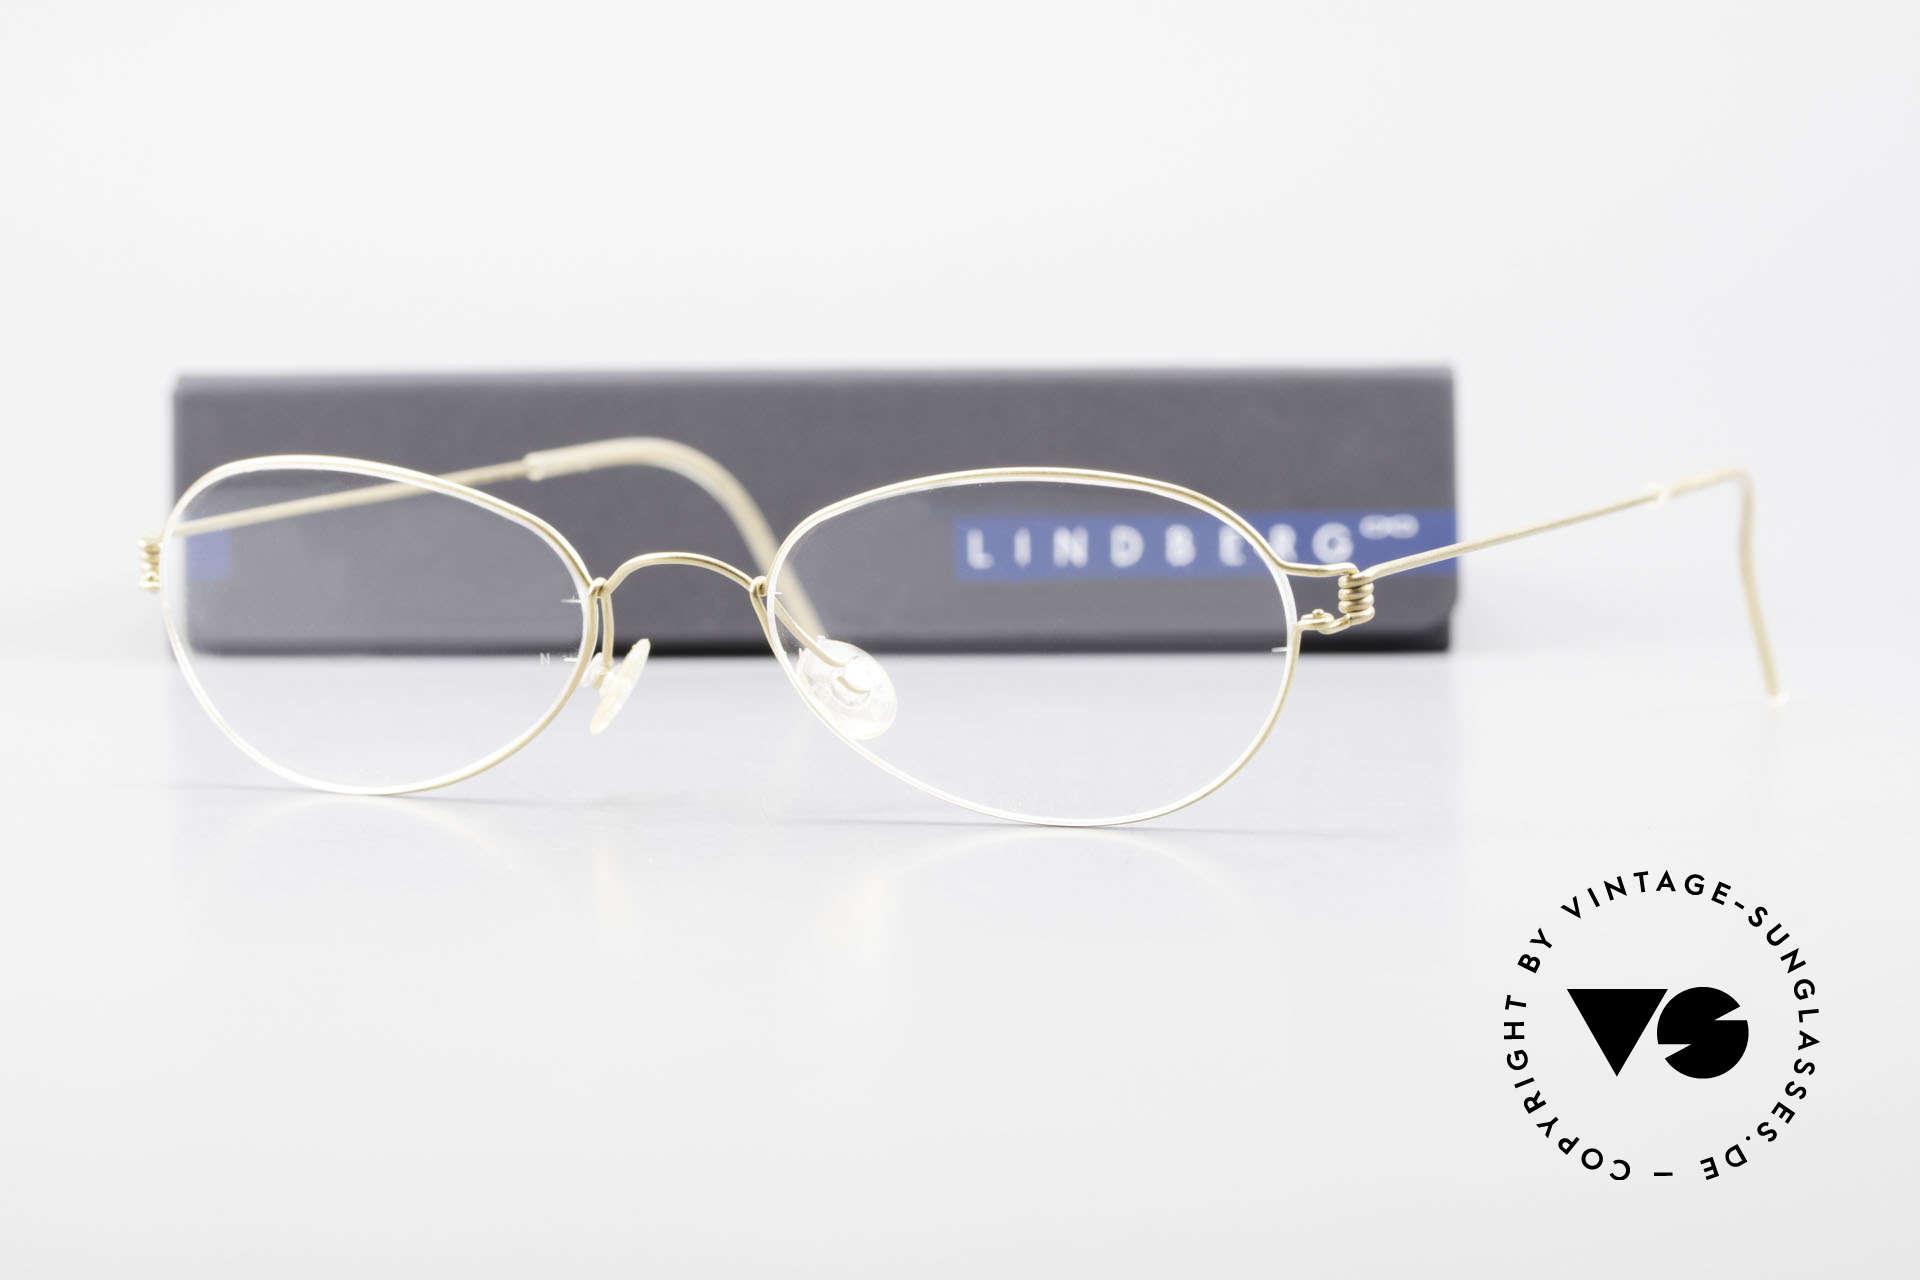 Lindberg Kari Air Titan Rim Titanium Ladies Eyeglasses, simply timeless, stylish & innovative: grade 'vintage', Made for Women